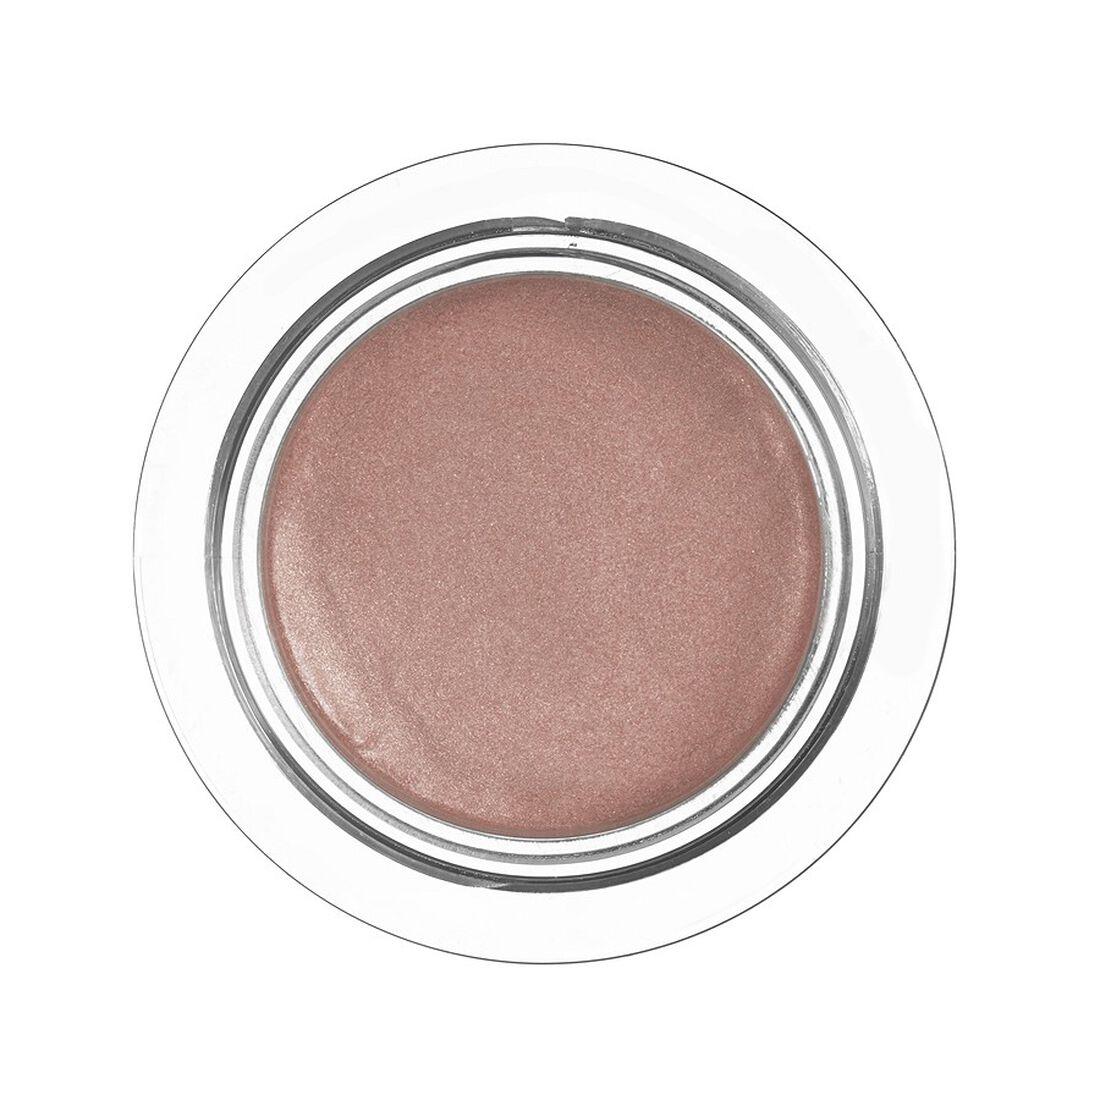 e.l.f. Cosmetics - Smudge Pot Cream Eyeshadow